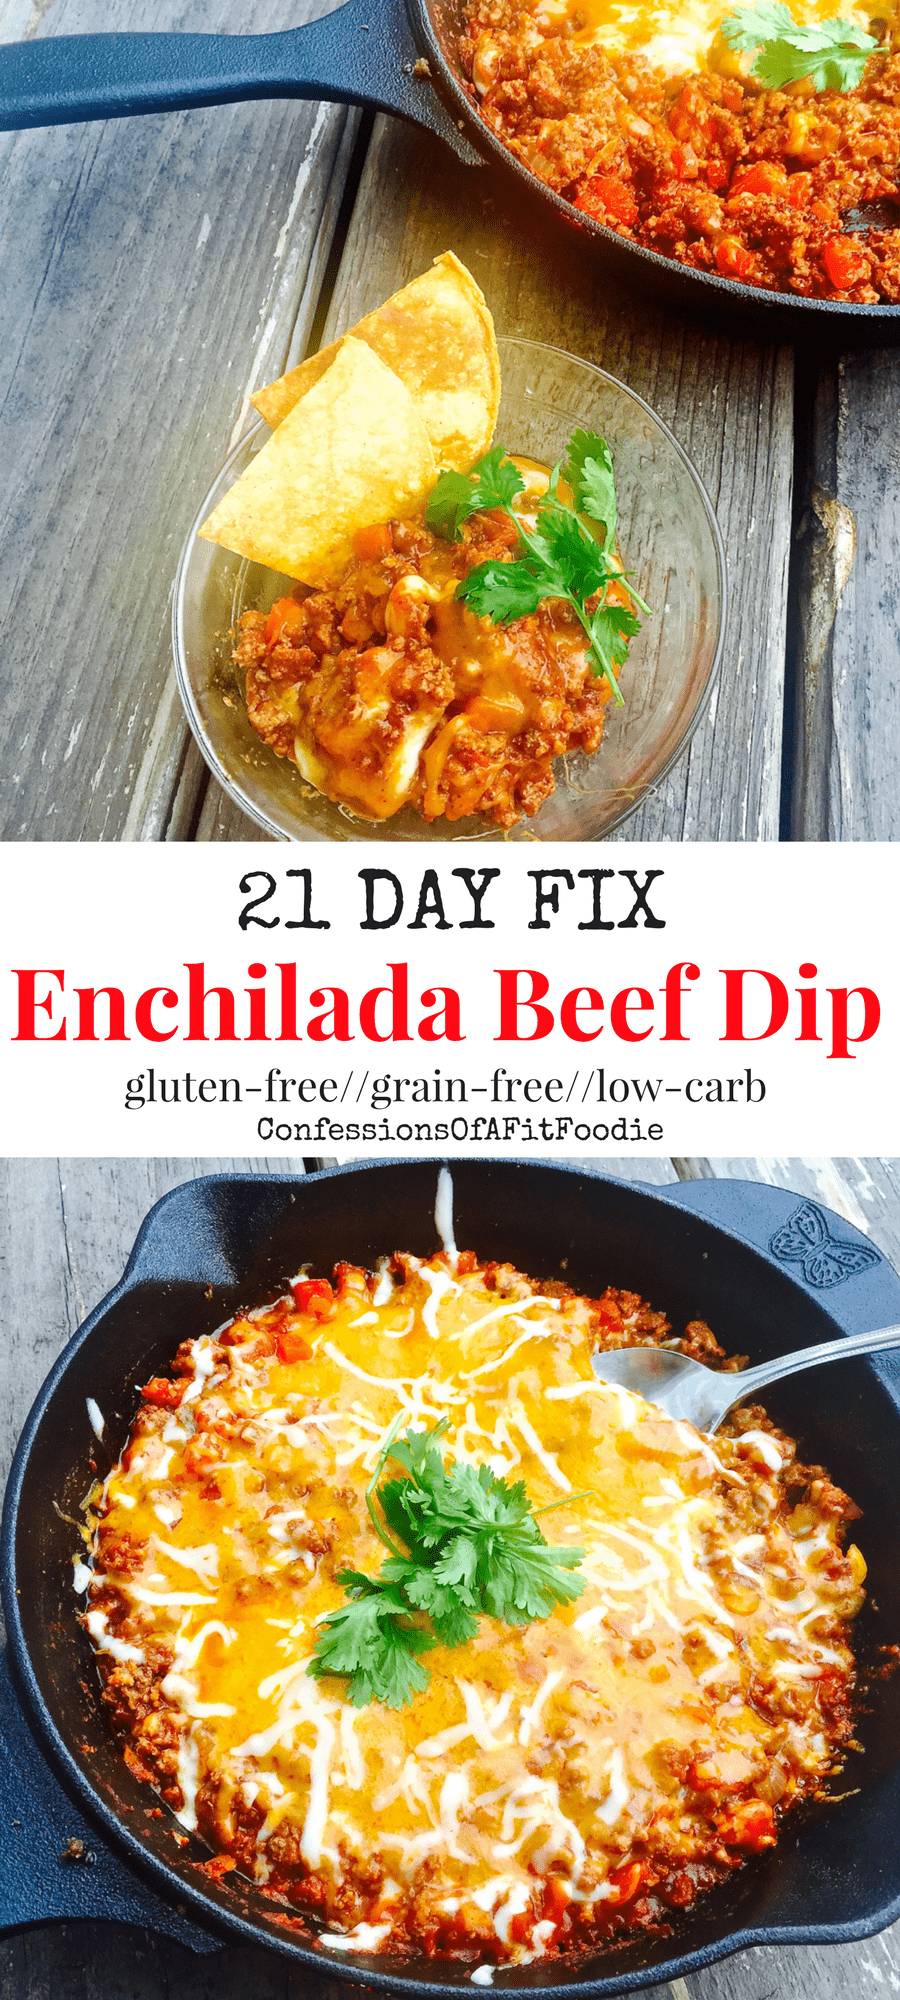 21 Day Fix Enchilada Beef Dip Stove Top Instant Pot